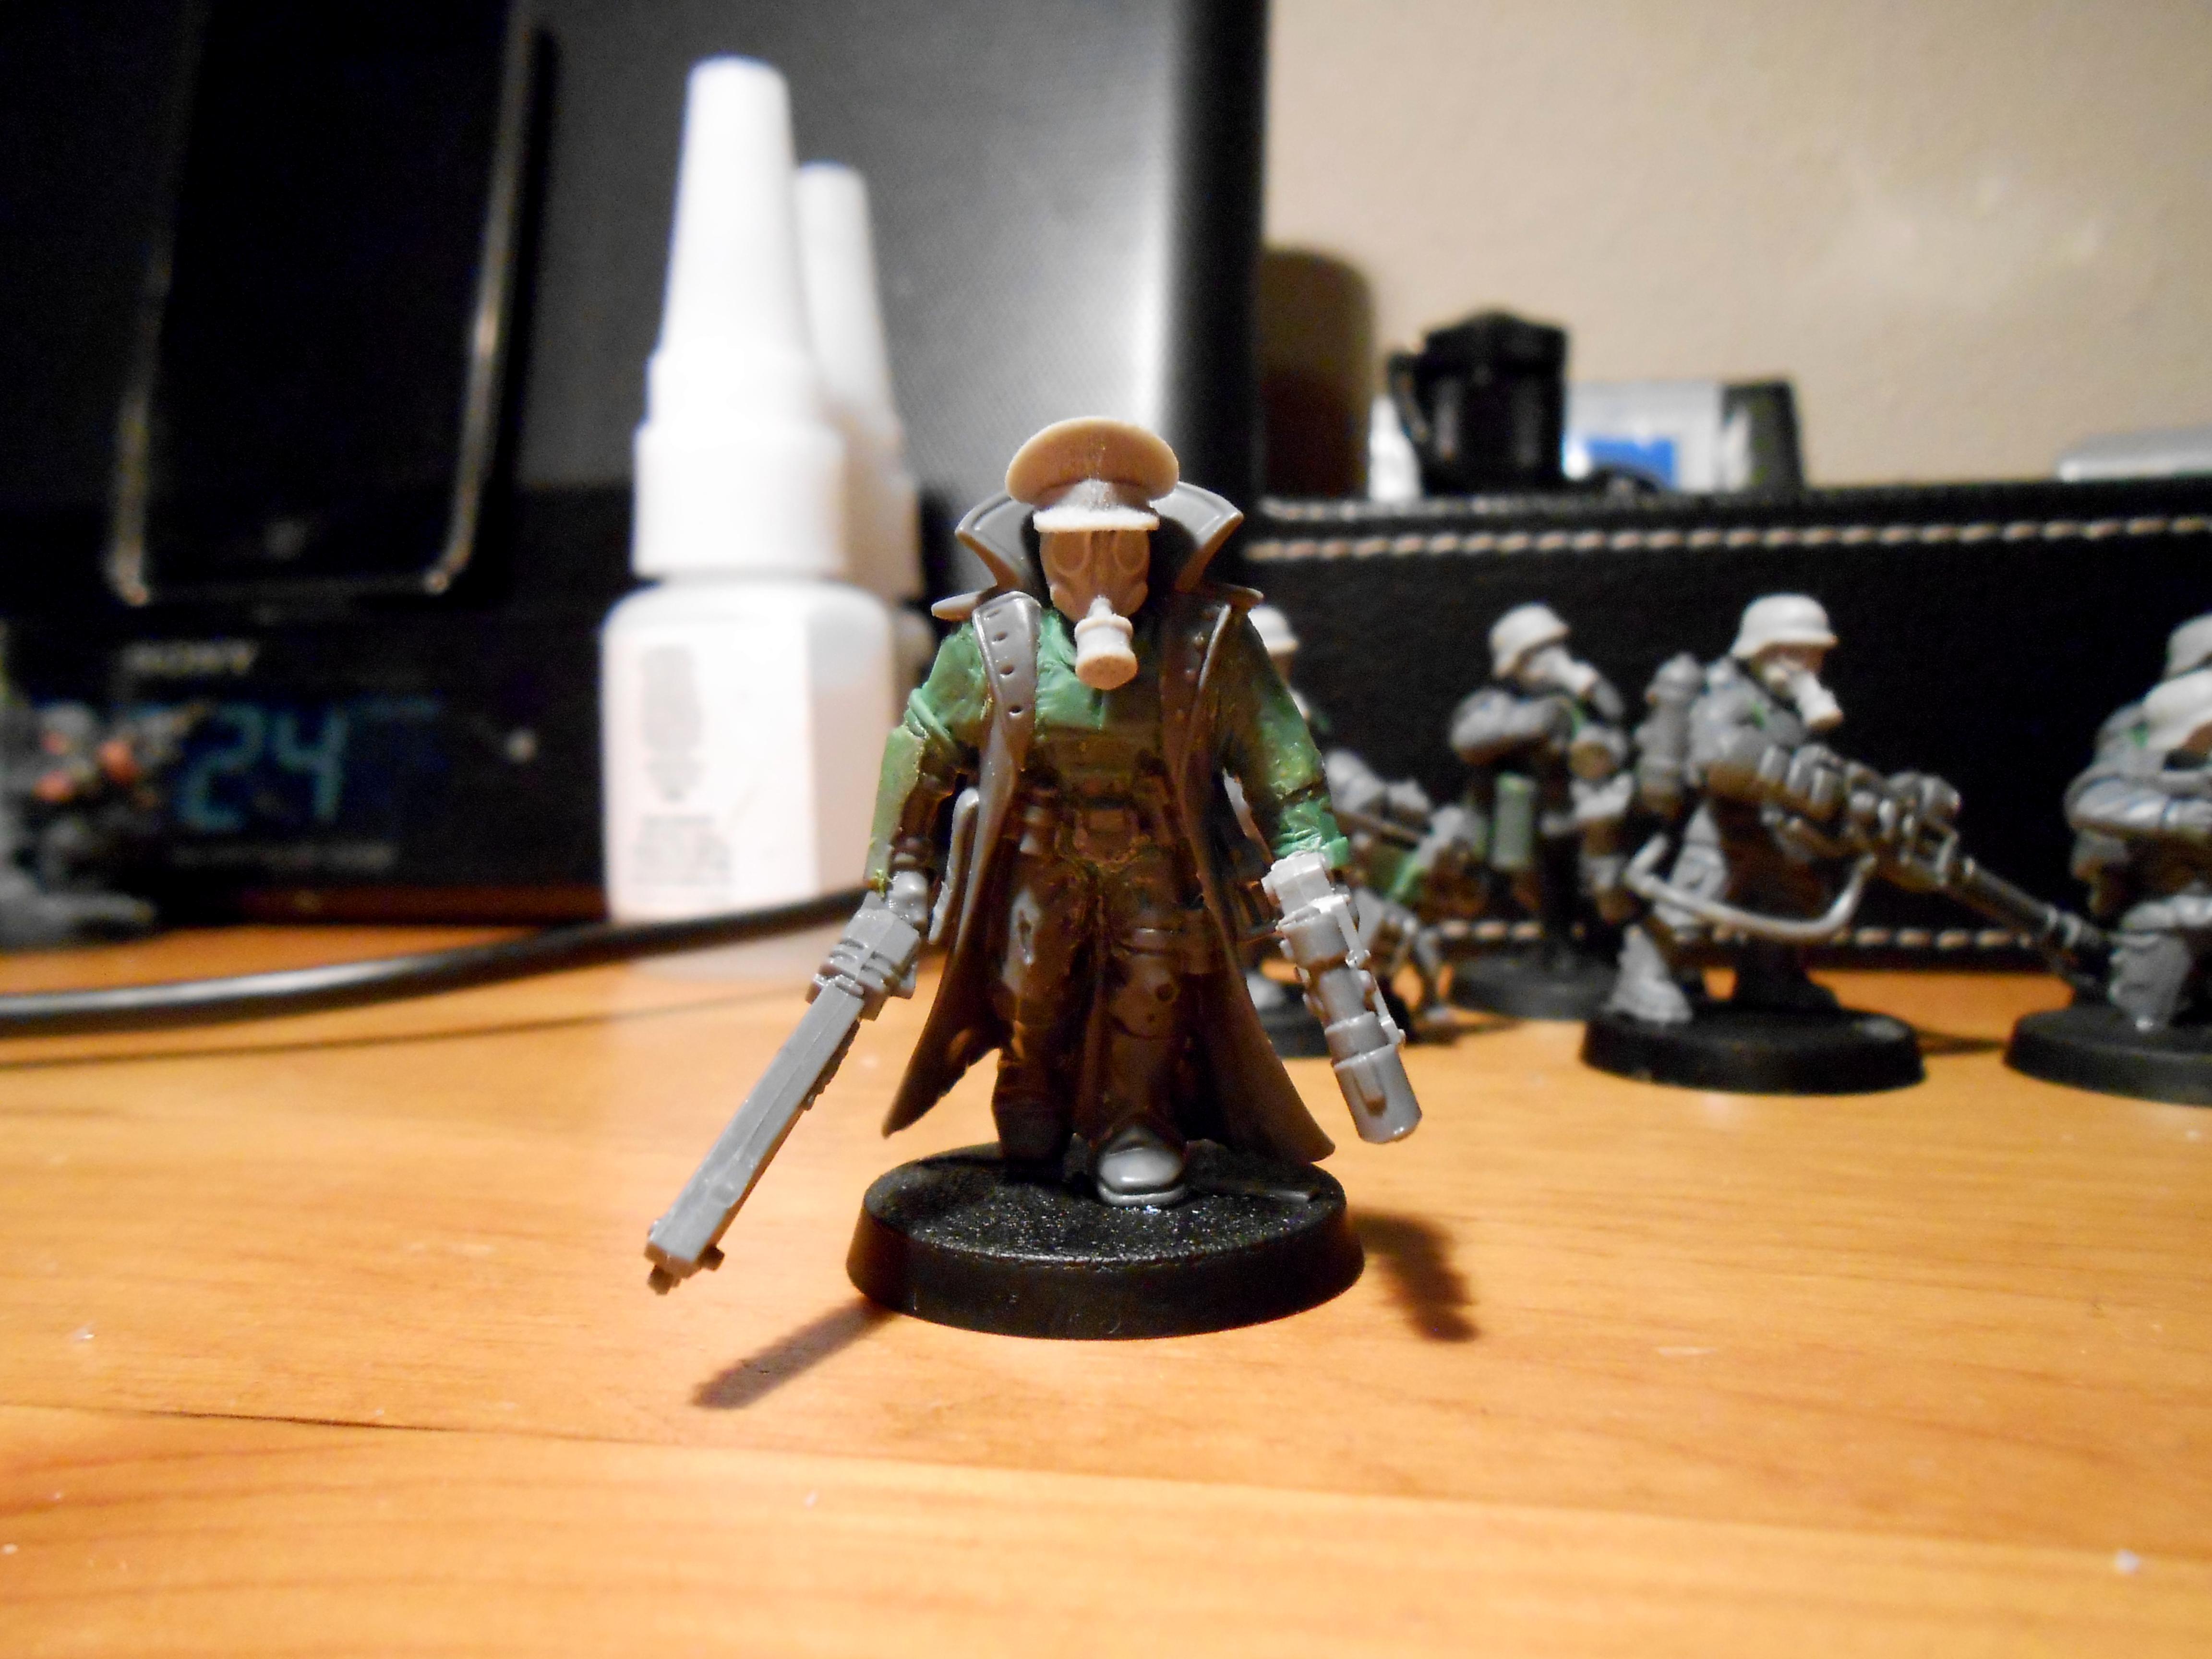 Wasteland, Wasteland Guardsmen